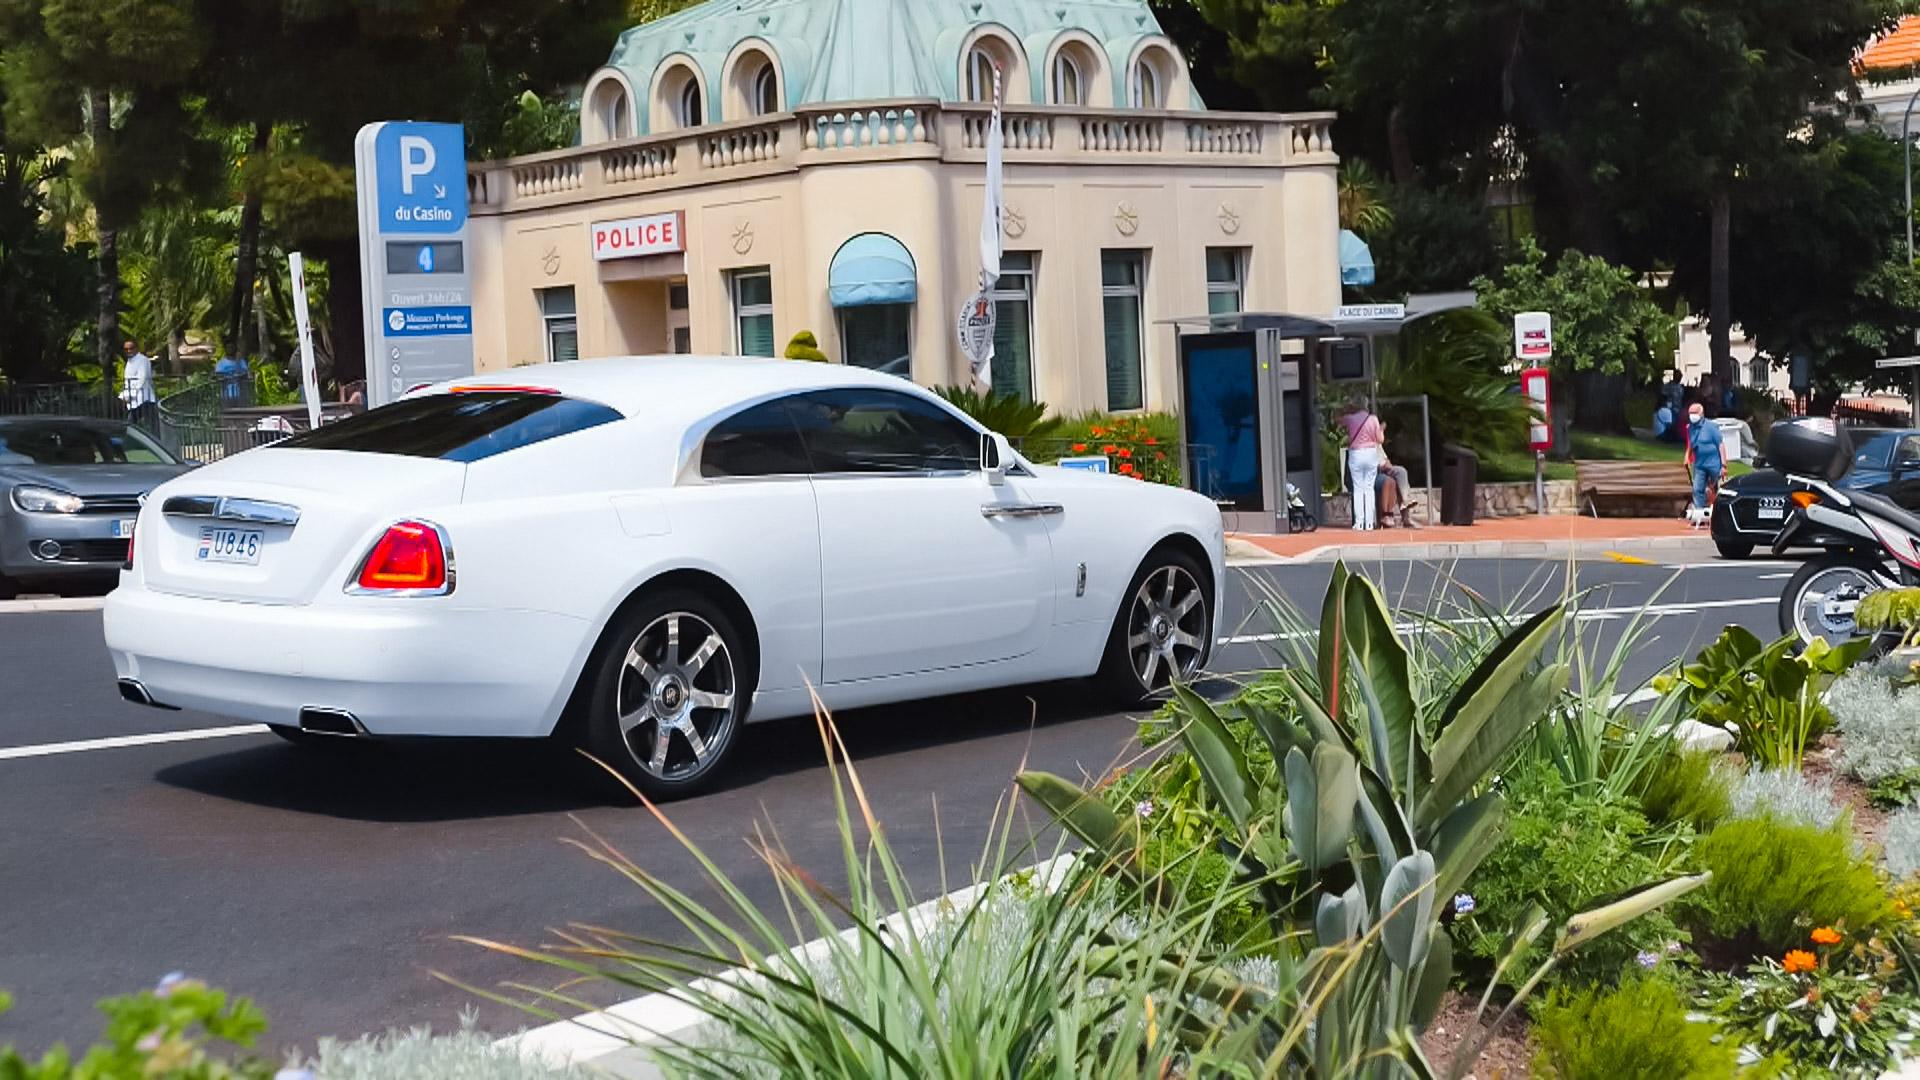 Rolls Royce Wraith - U846 (MC)